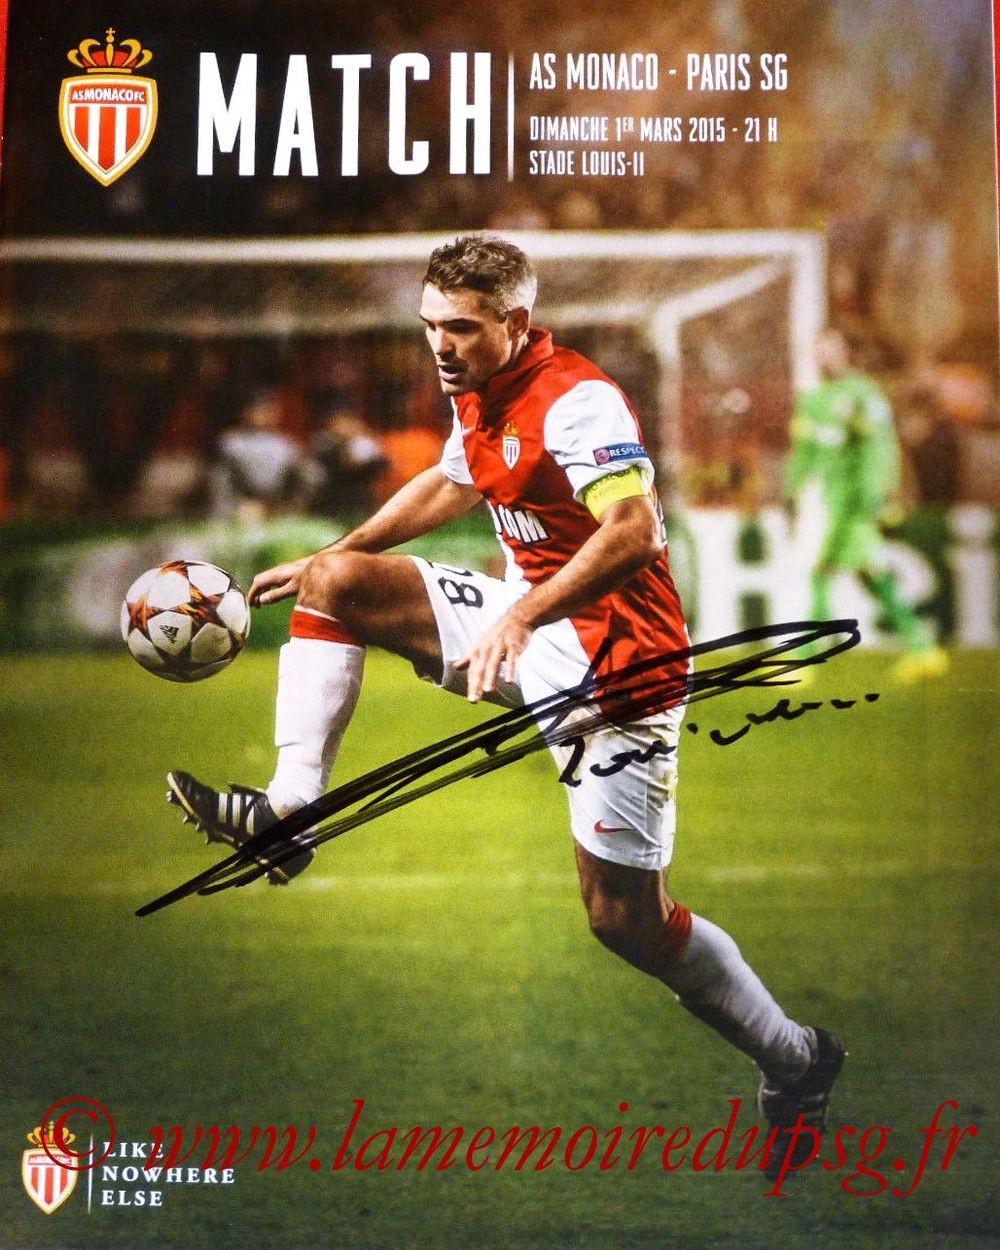 2015-03-01  Monaco-PSG (27ème L1, ASM match)